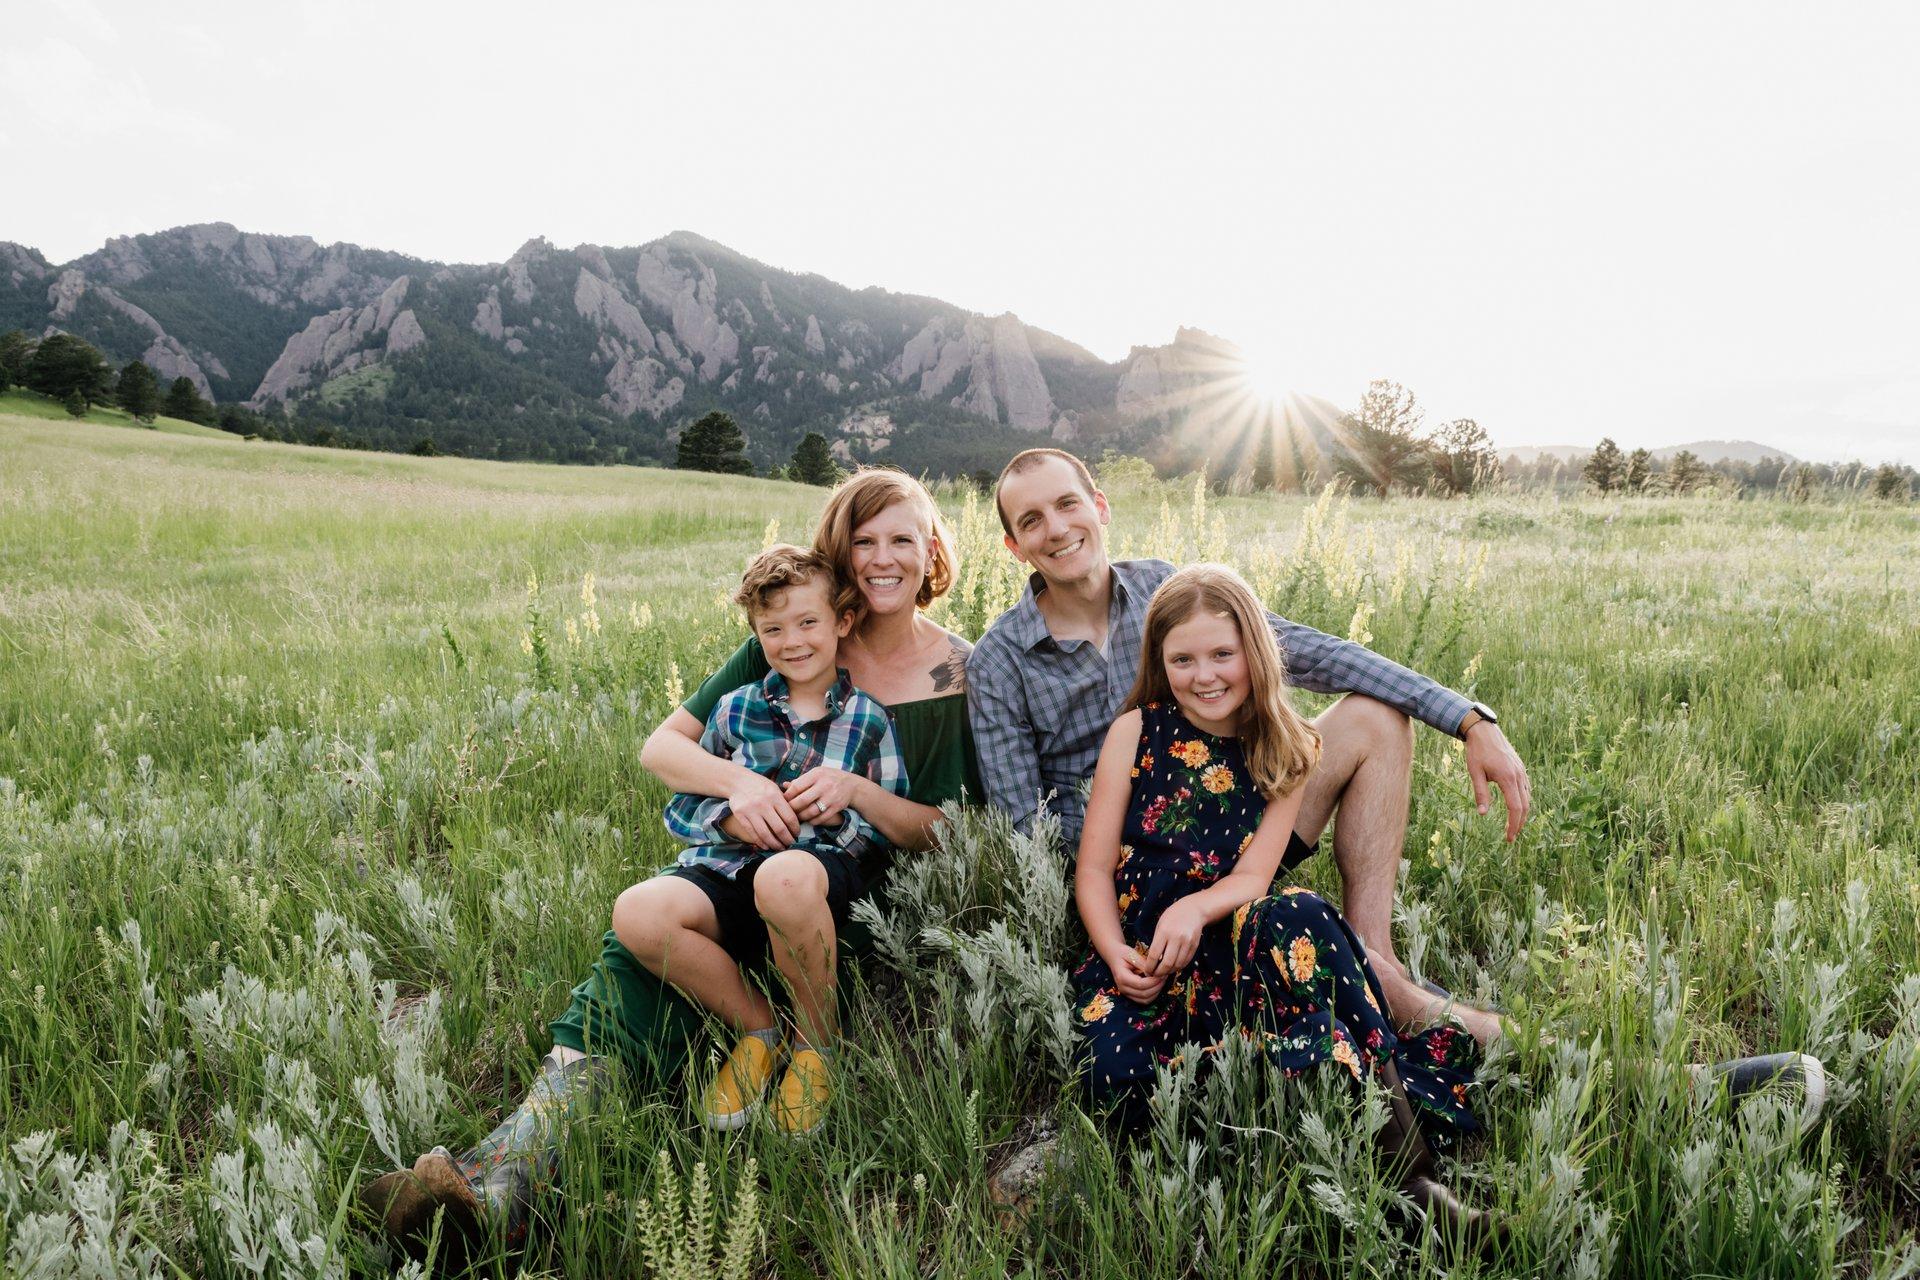 Flytographer Travel Story - Boulder Family Pictures